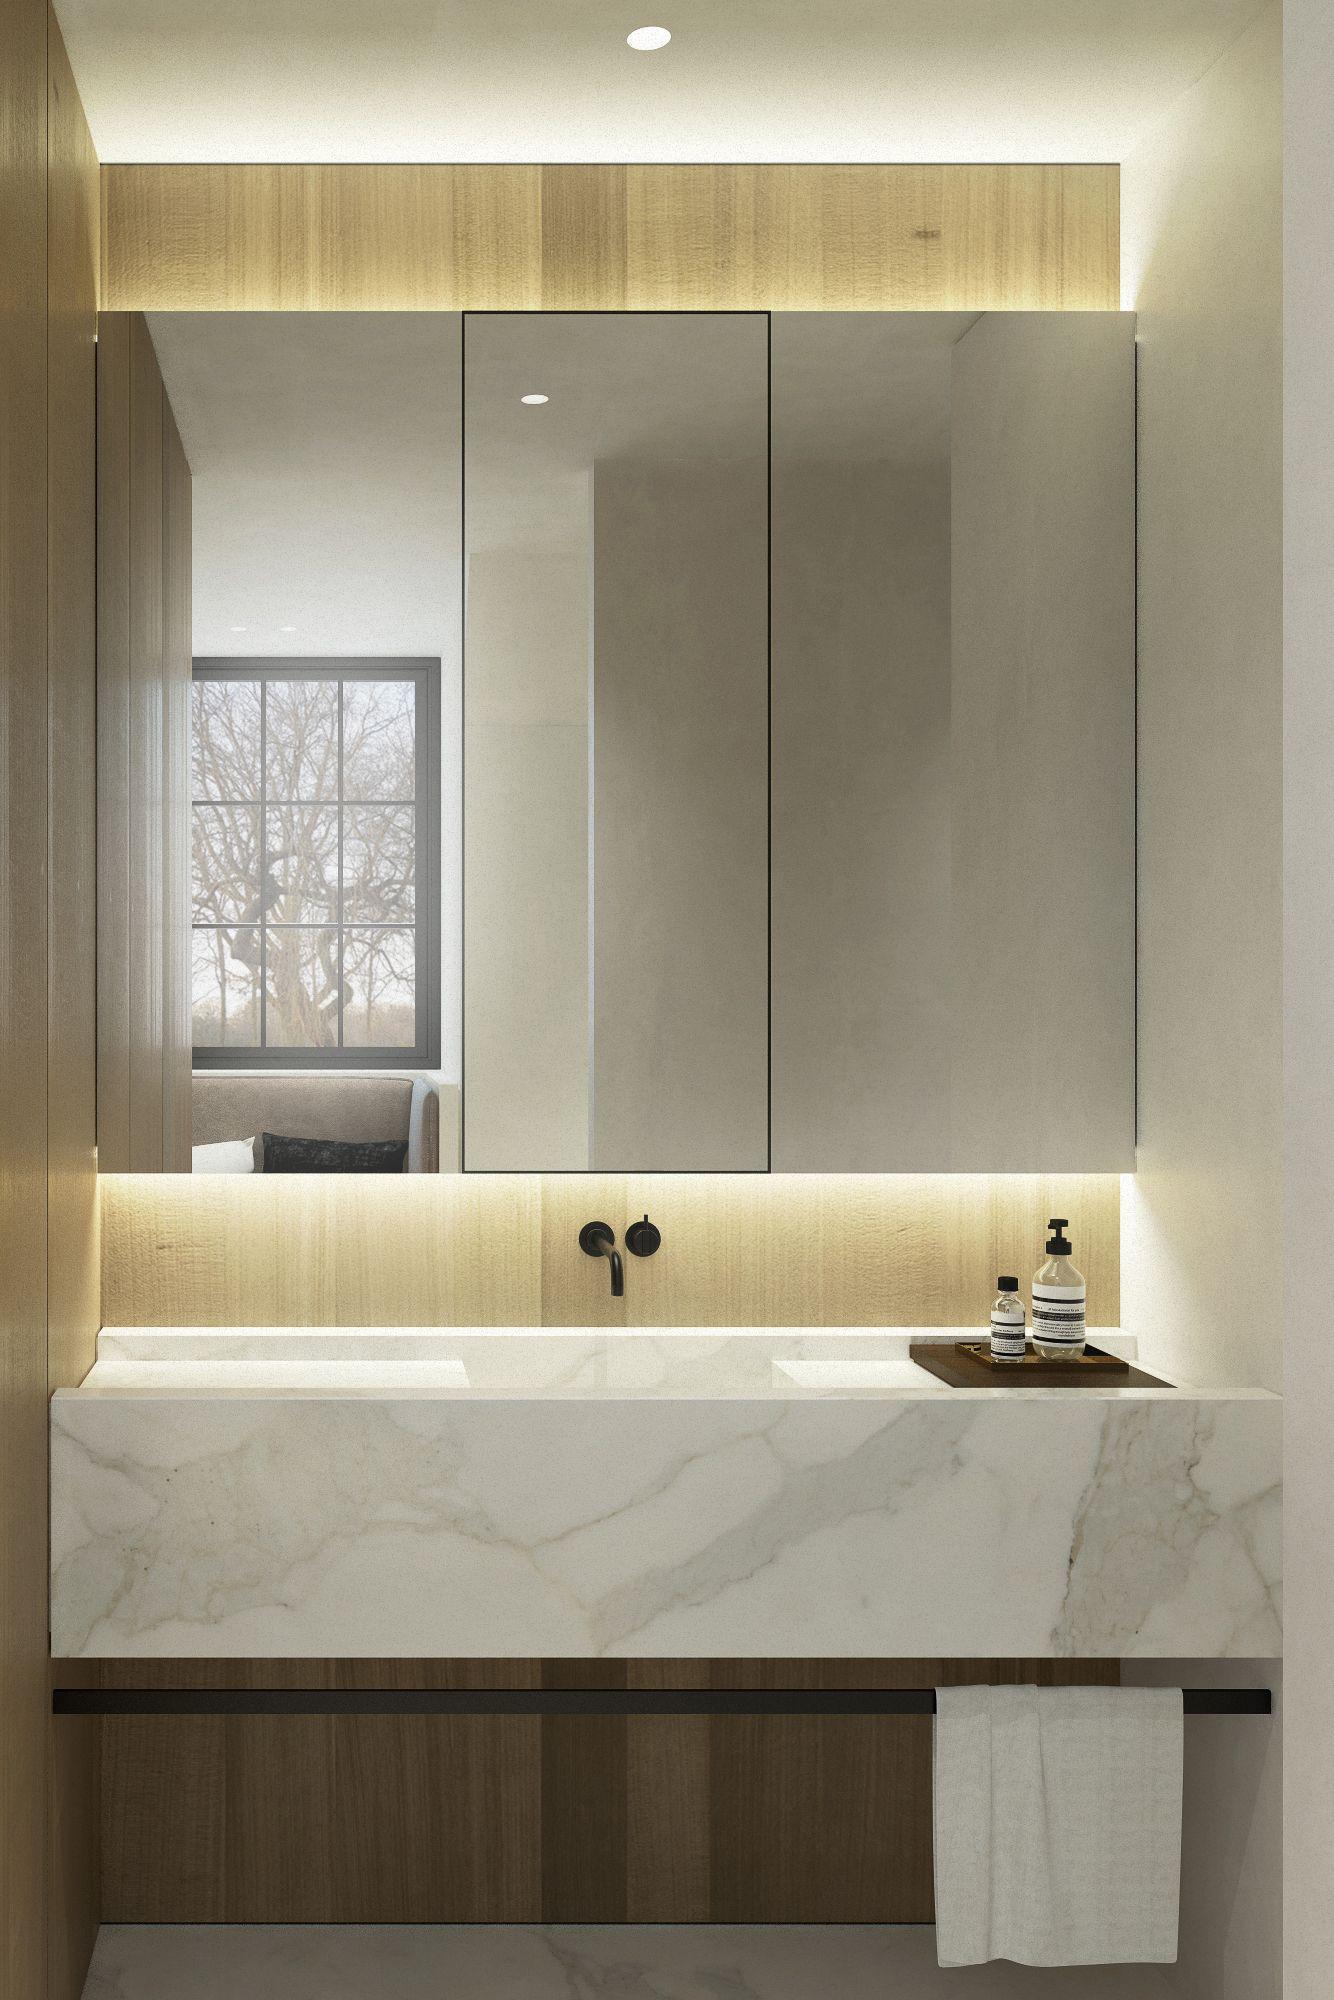 JV House by Dieter Vander Velpen Architects bathrooms